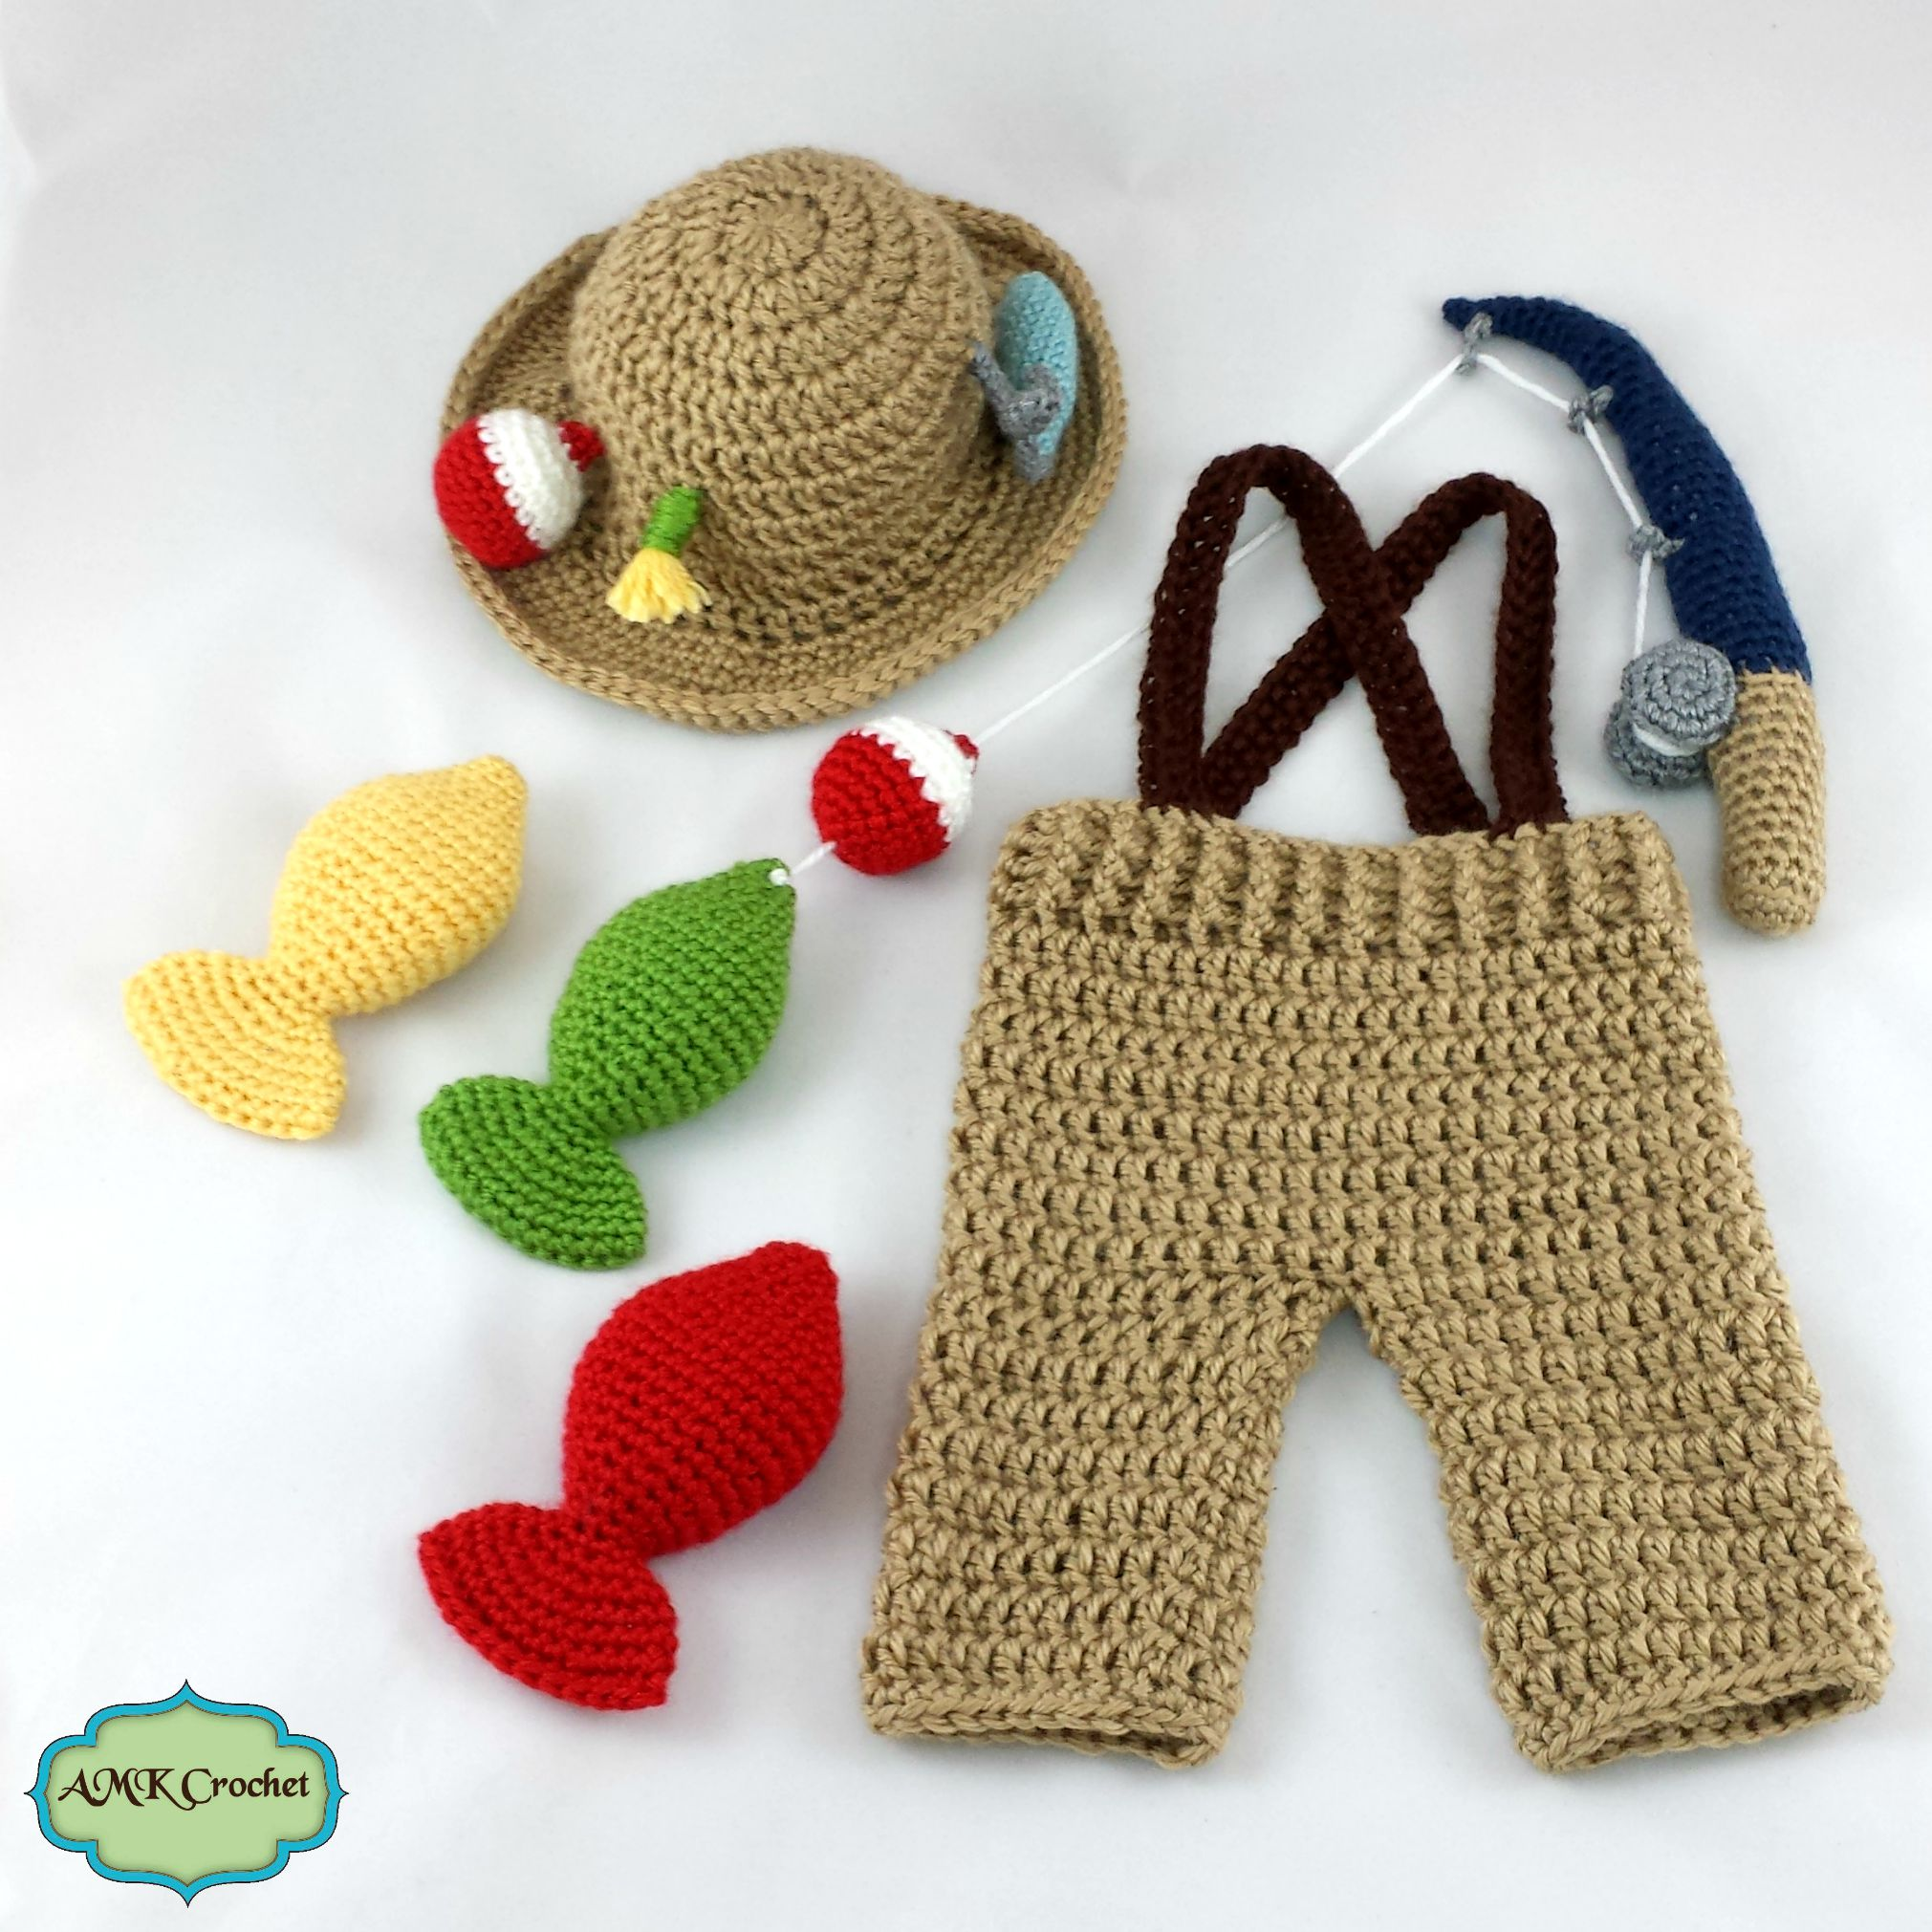 Crochet newborn fisherman outfit pattern amk crochet for Toddler fishing hat